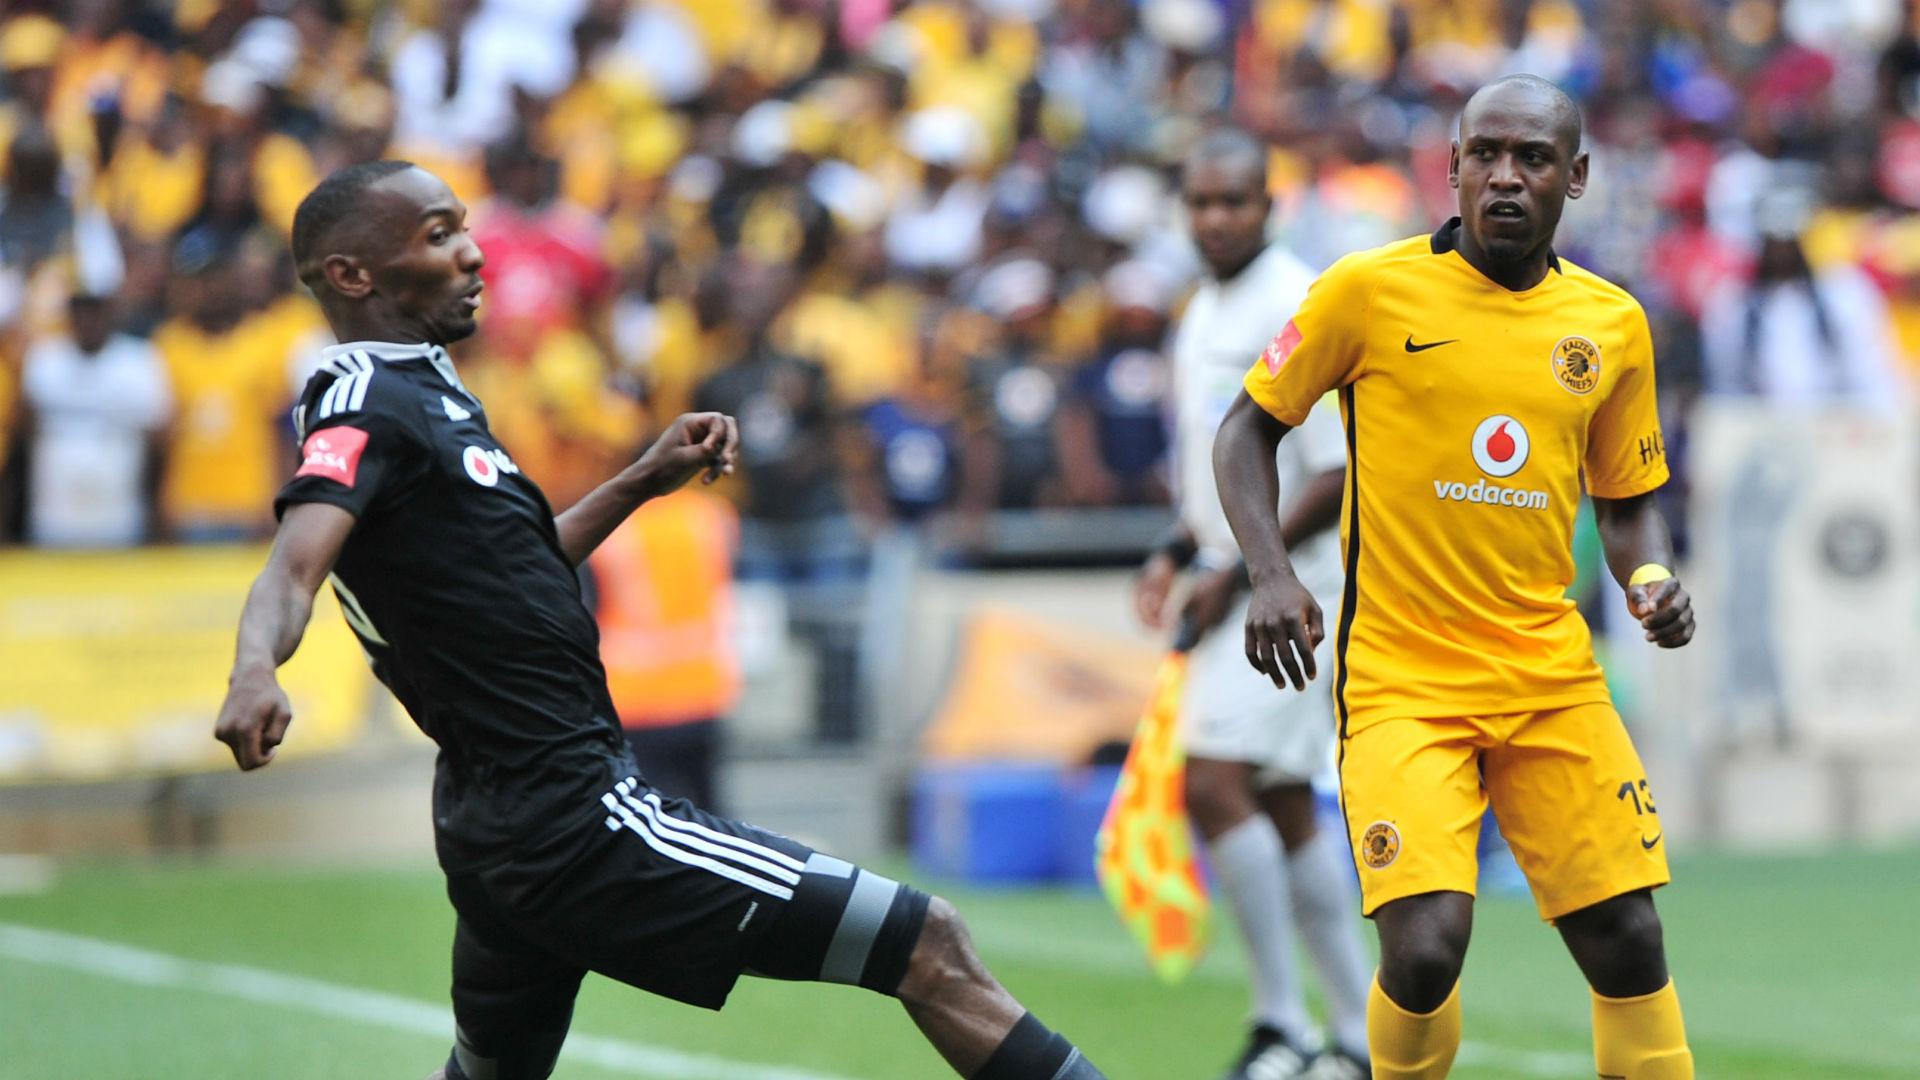 Thabo Rakhale & Sibusiso Khumalo